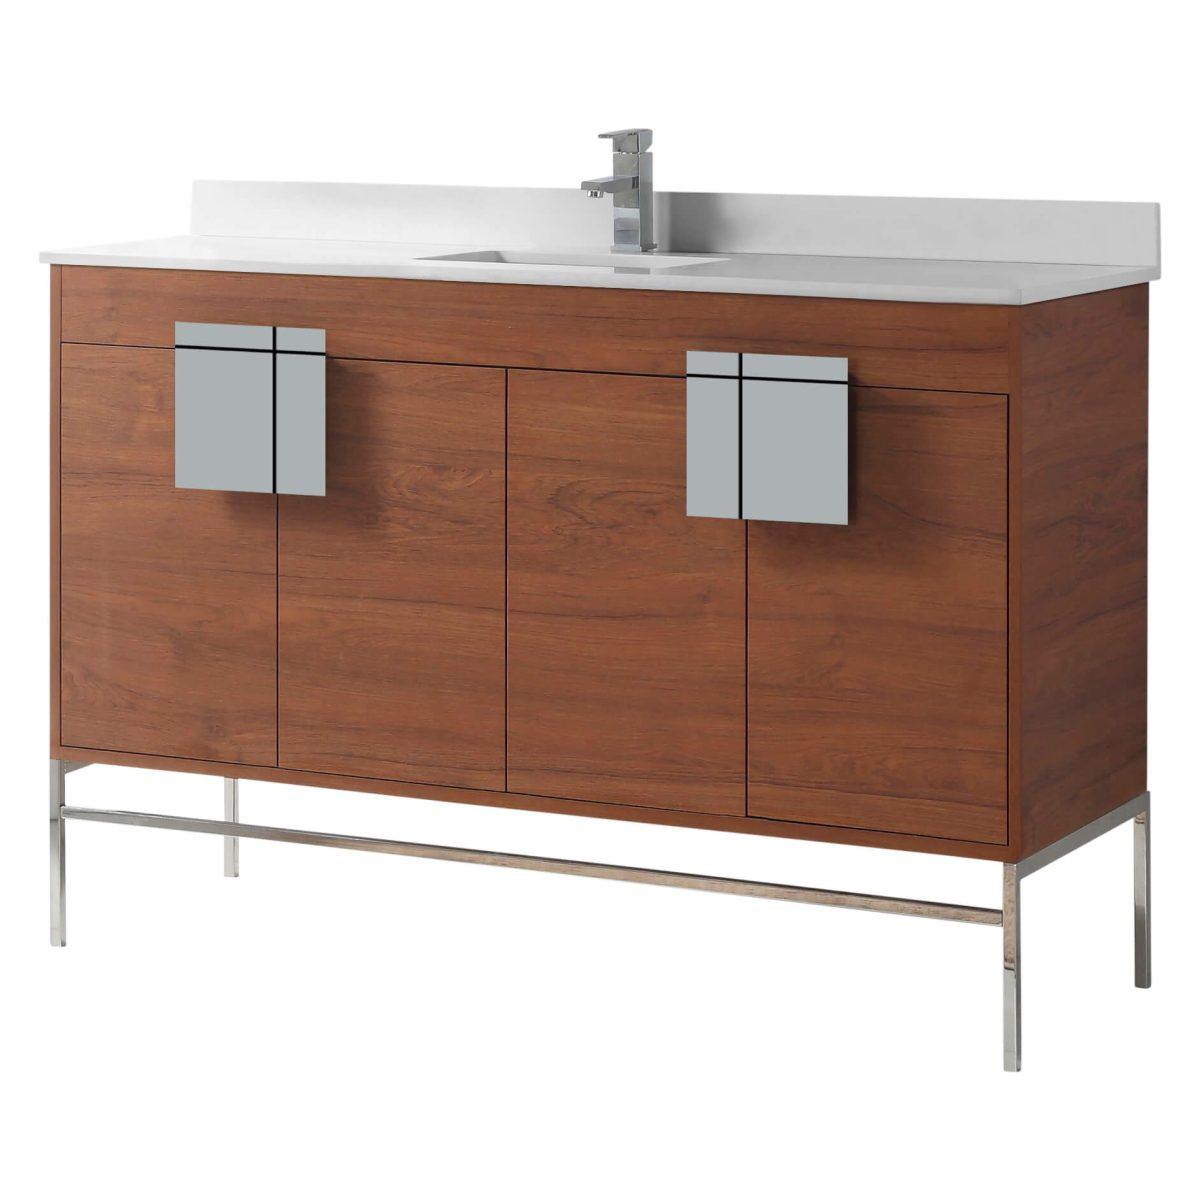 "Shawbridge 60"" Modern Single Bathroom Vanity  Spicy Walnut with Chrome Hardware"